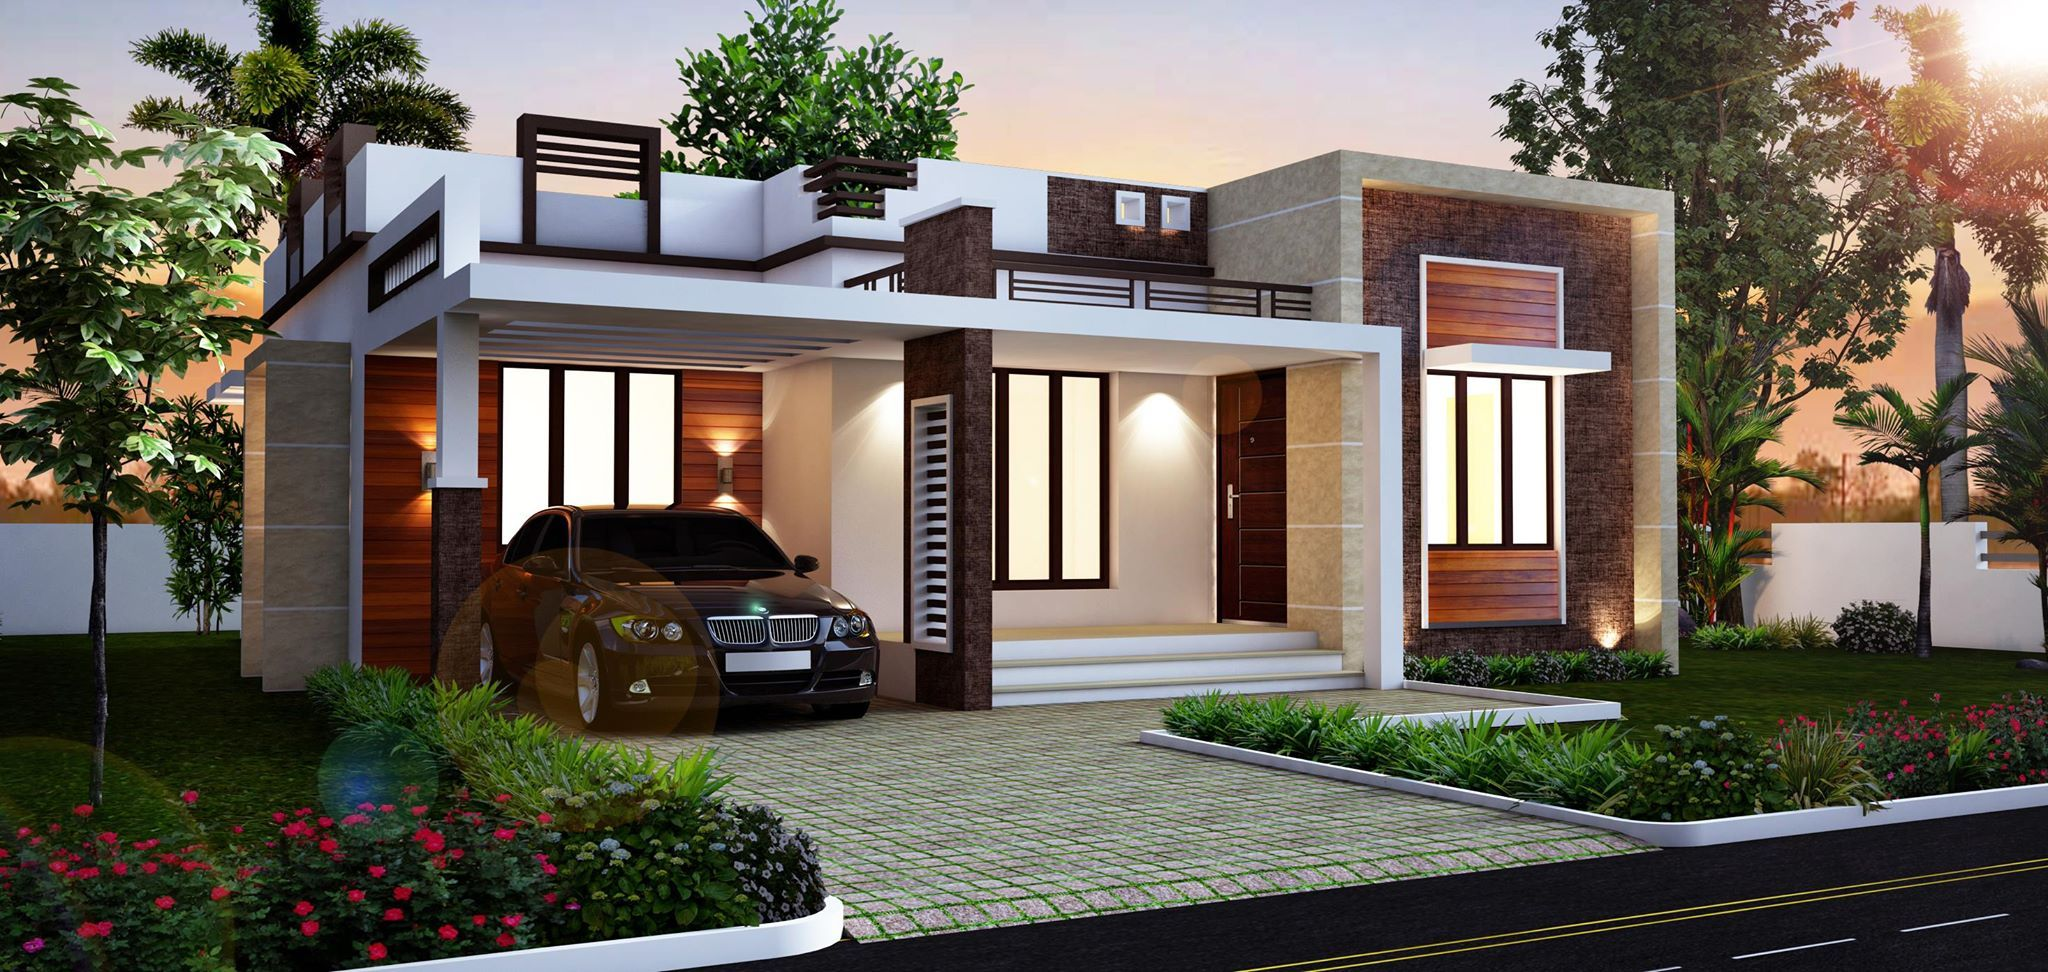 courtyard designs kerala - Google Search | Kerala house ...